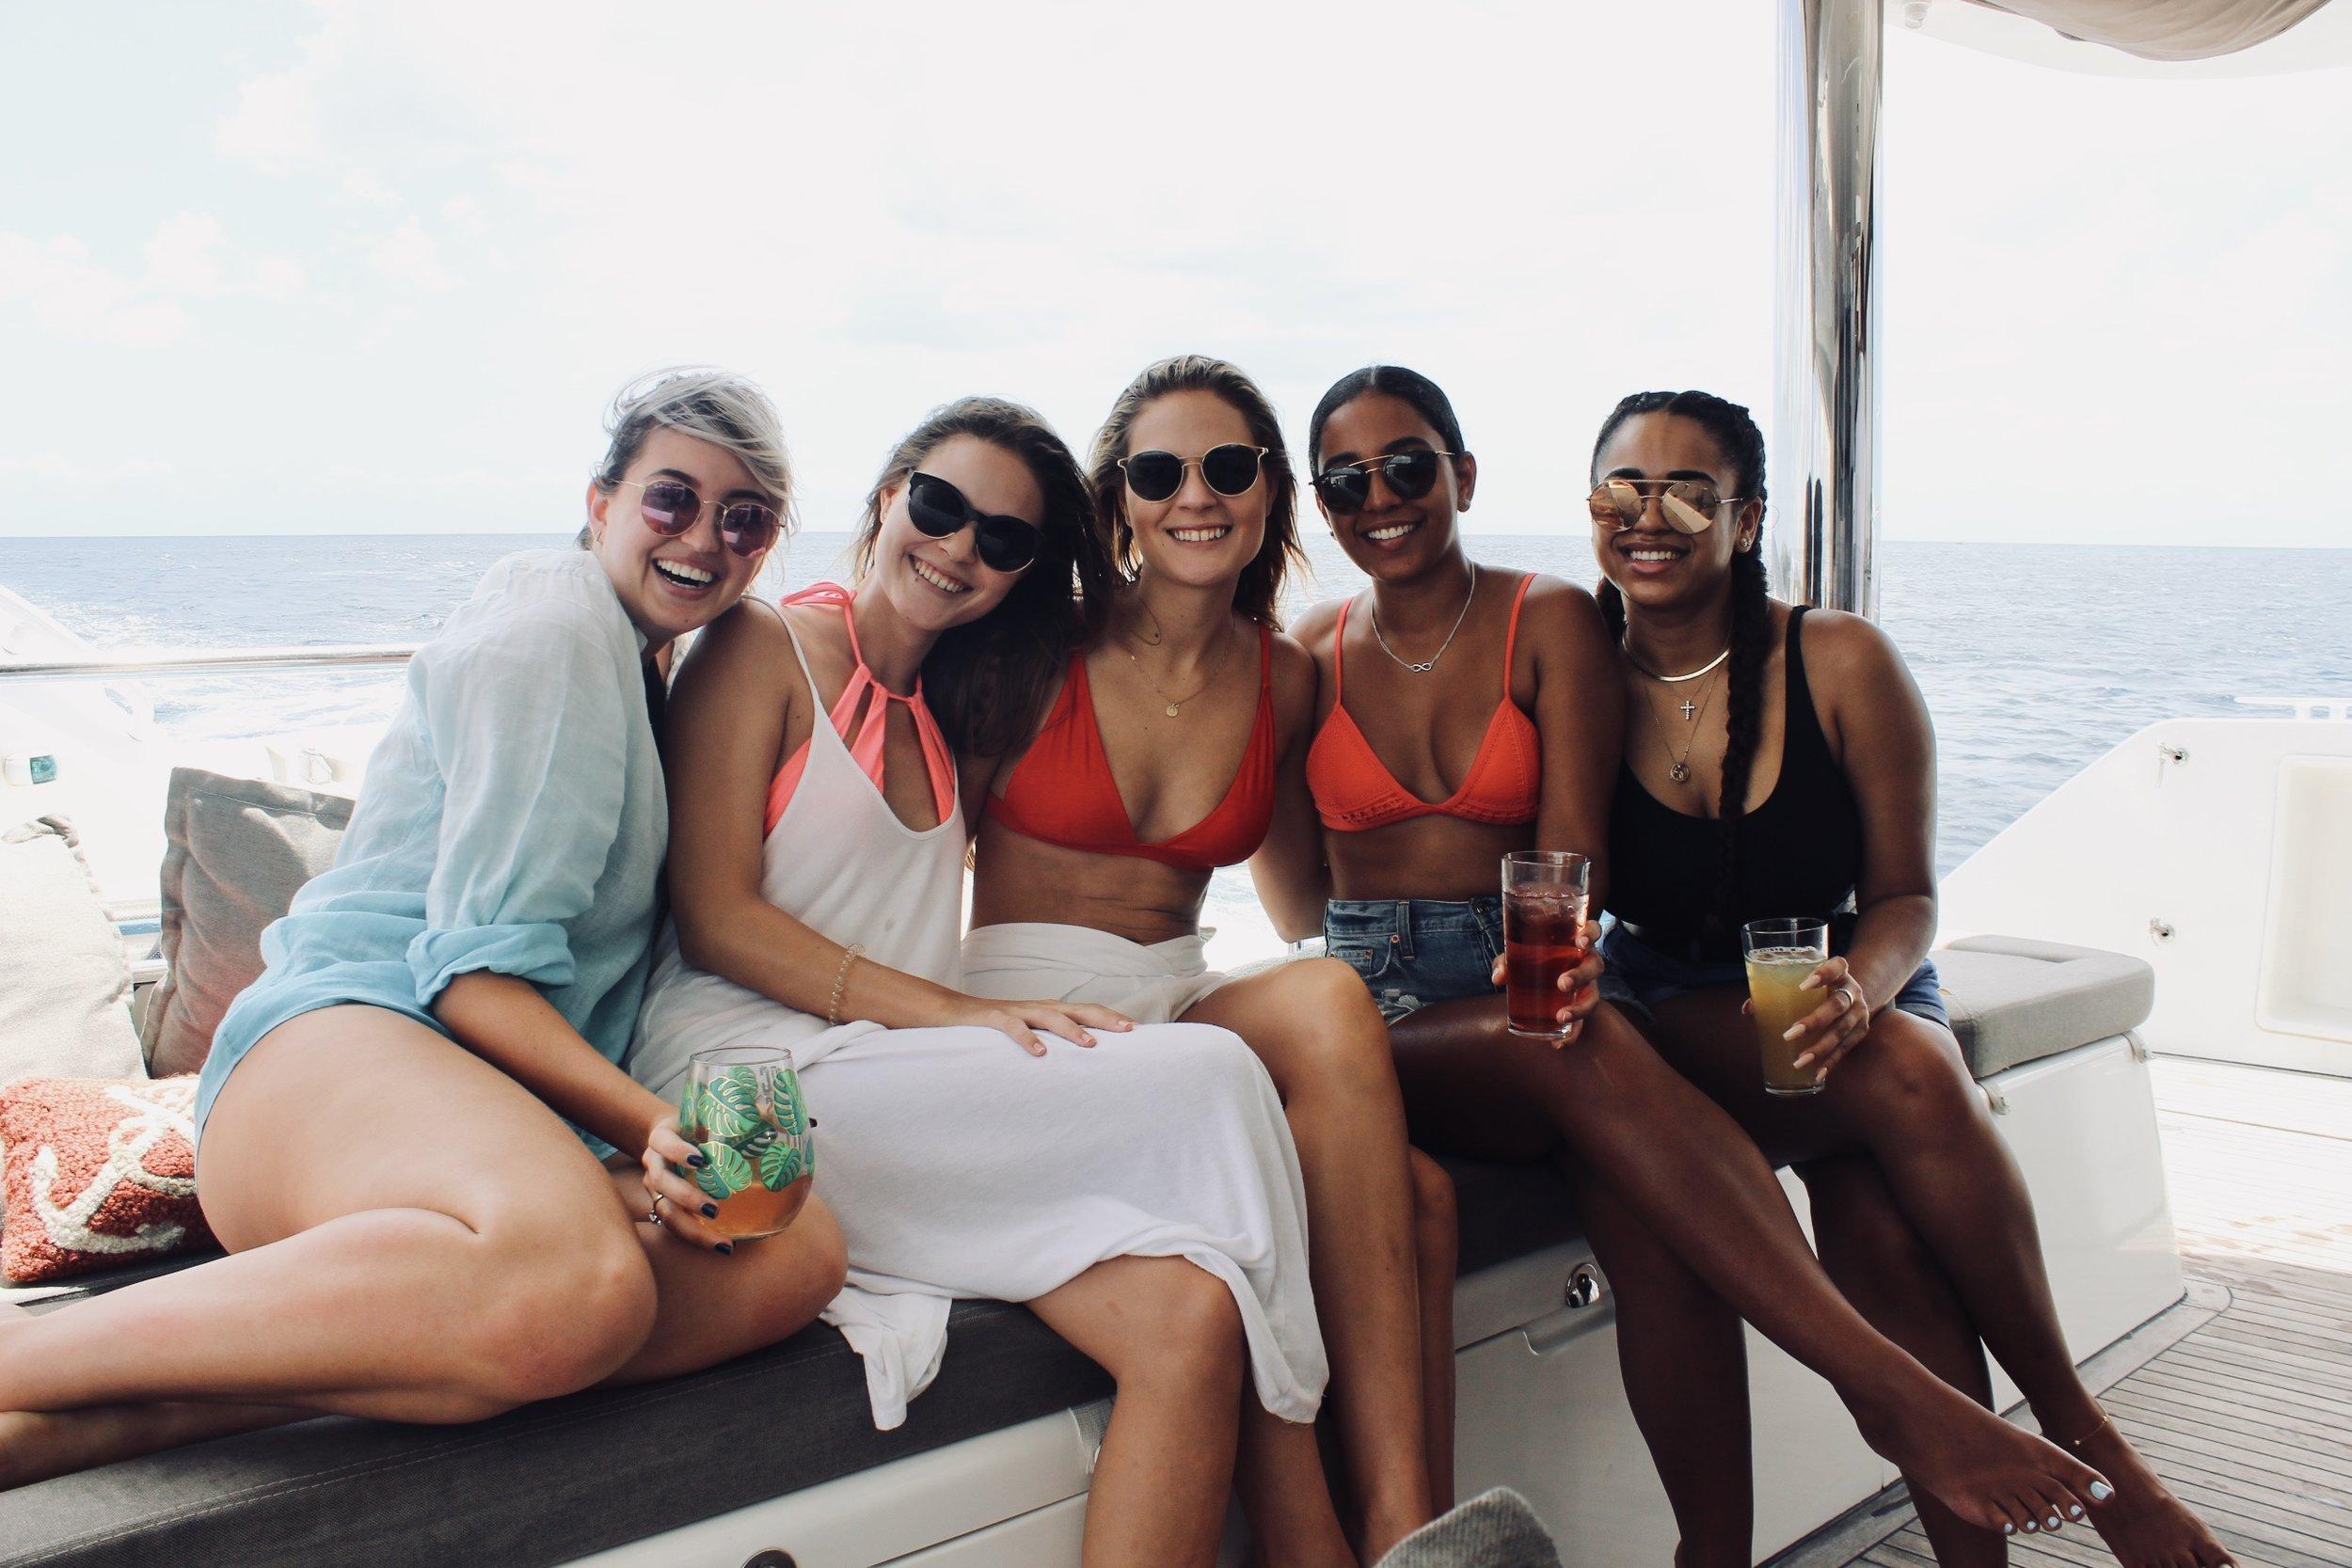 blogpost.boat.blog.birthday.love.friends.island.barbados.catamaran.coolrunnings.drinks.island.love.